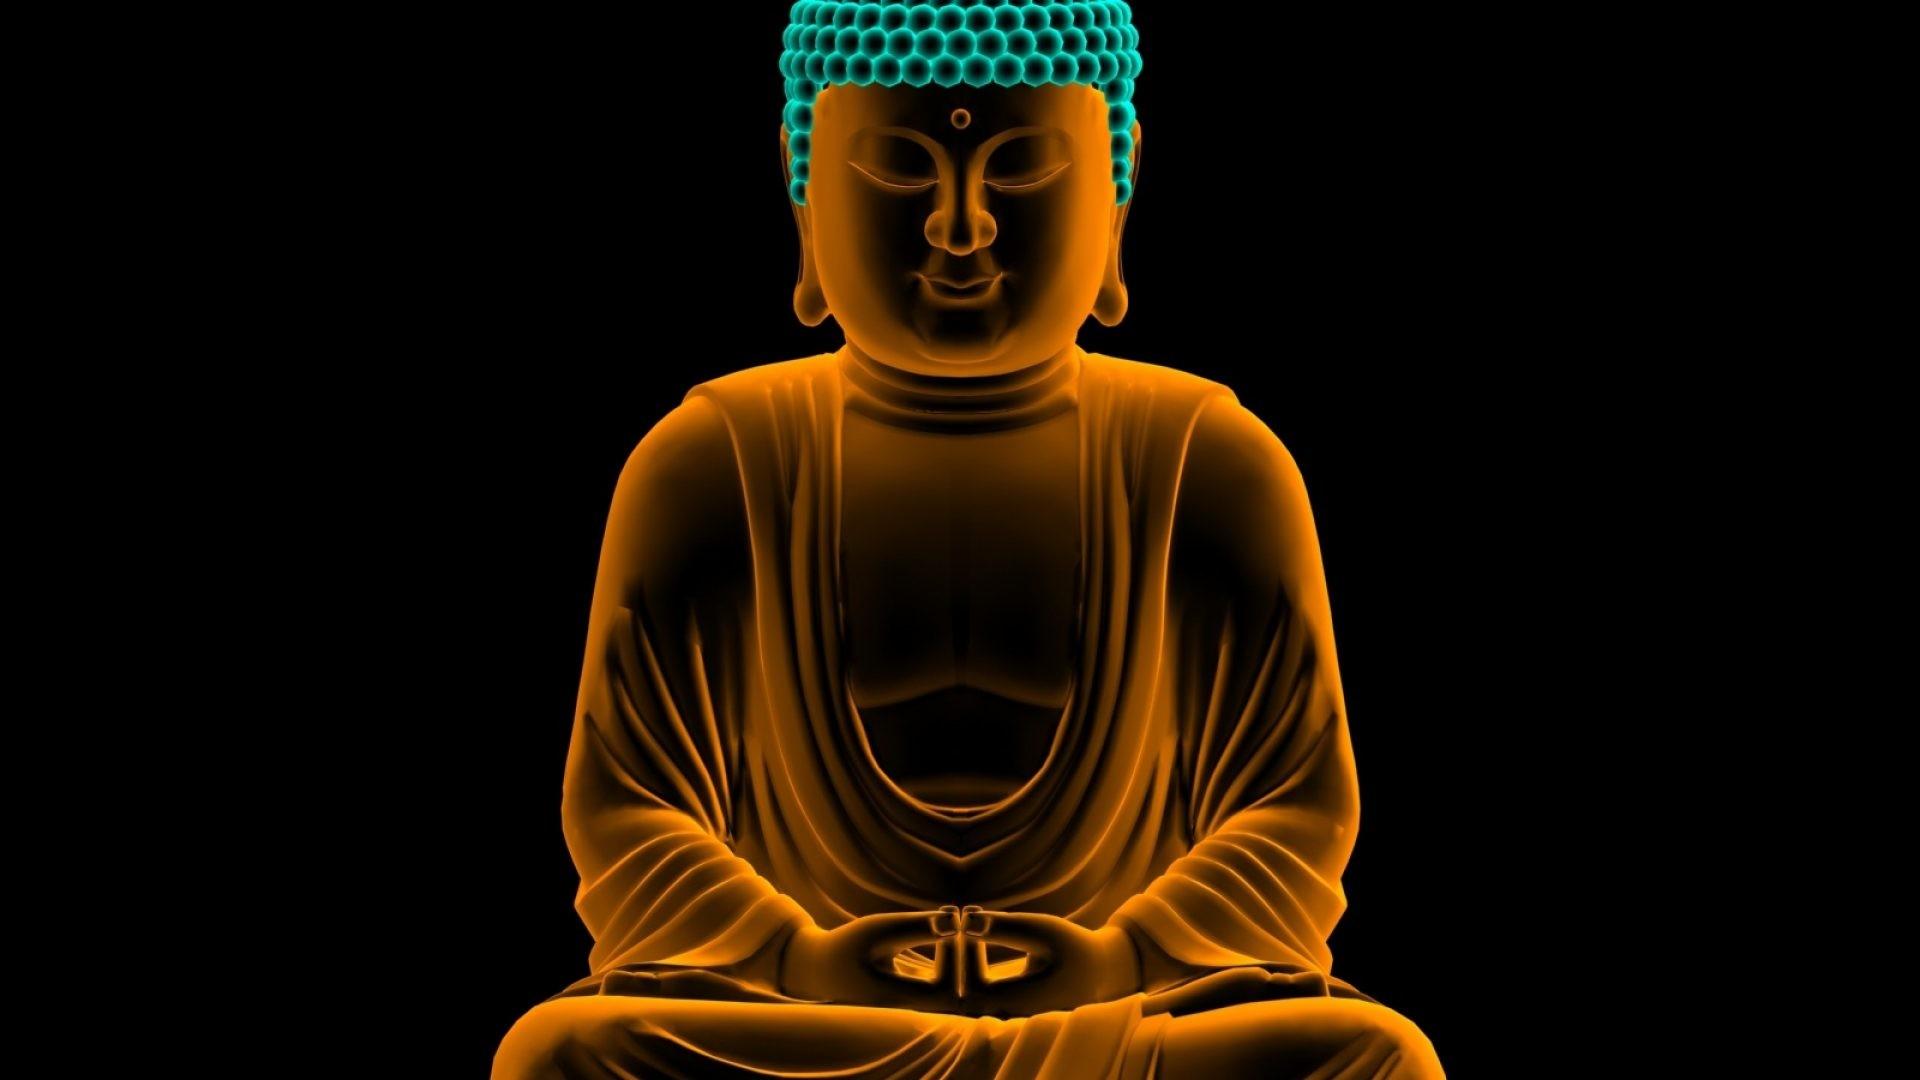 Lord Buddha Design HD Wallpapers